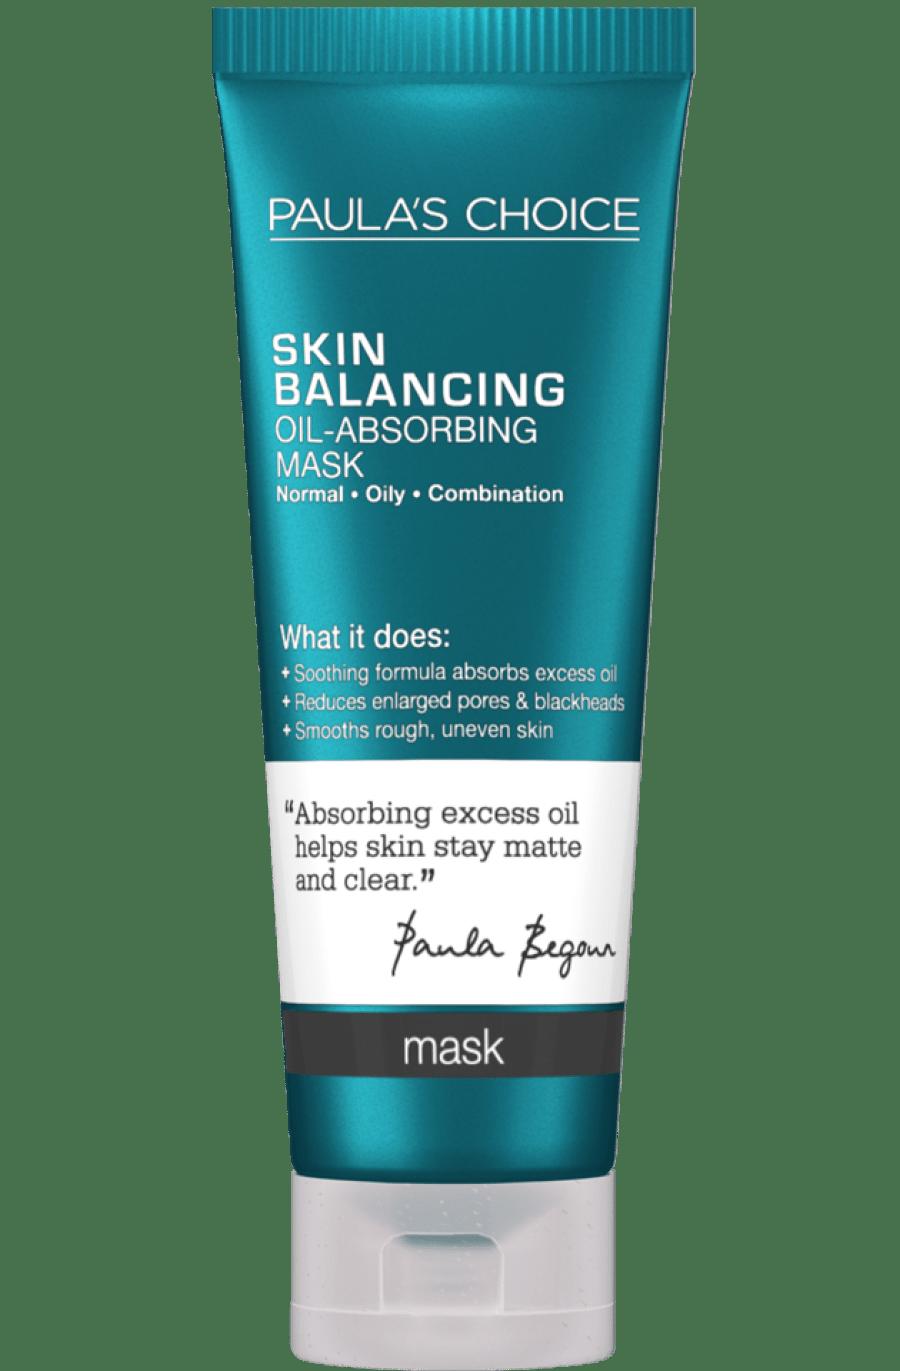 PaulasChoice_SkinBalancing_OilAbsorbingMask